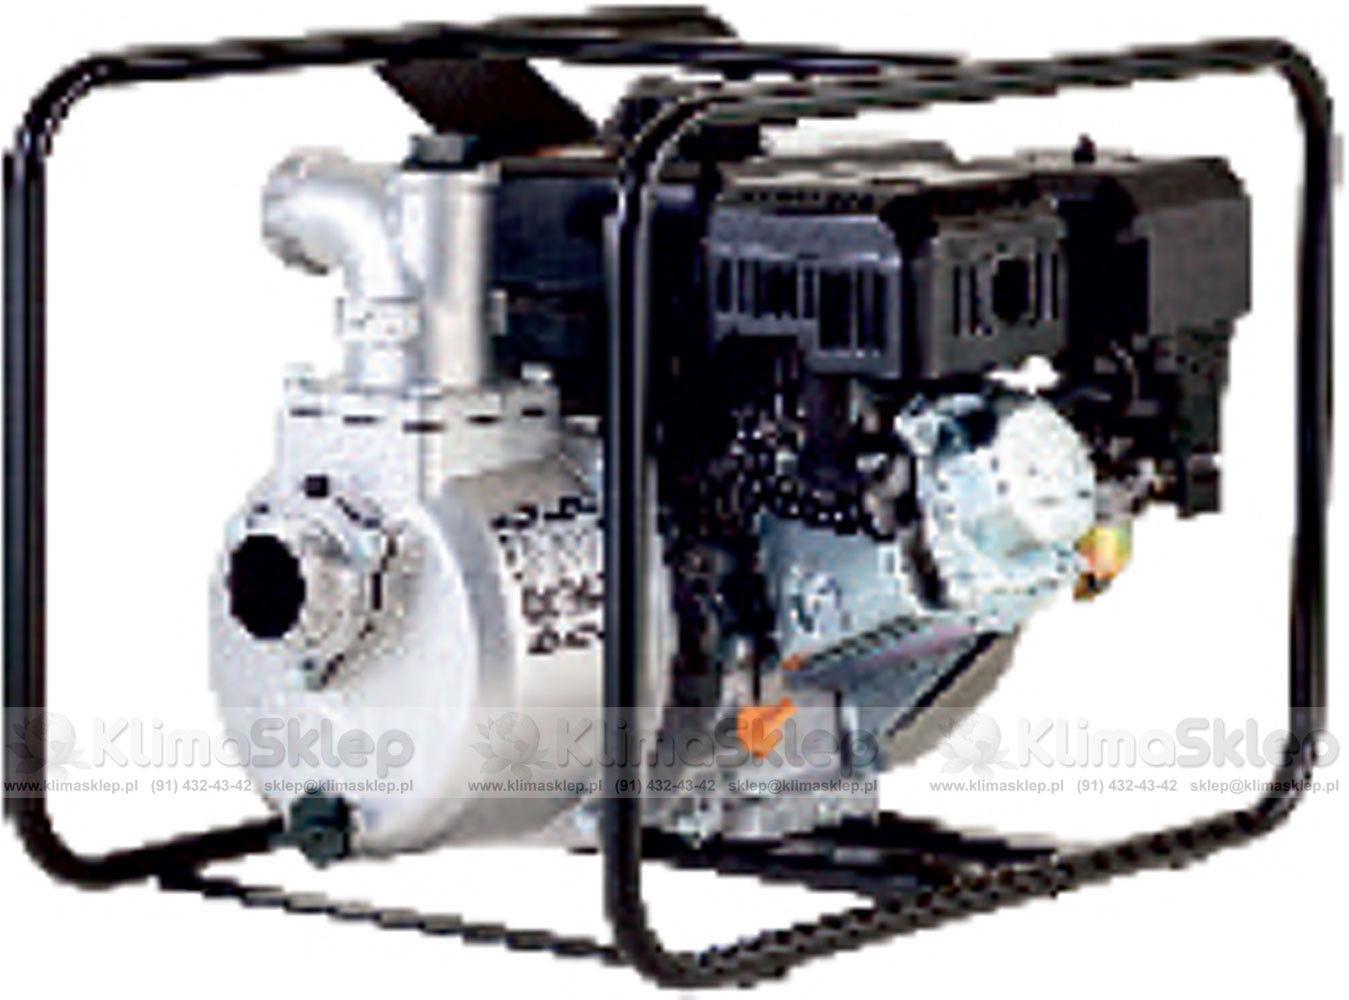 KOSHIN STH 50 E Motopompa do wody brudnej - numer katalogowy 98221